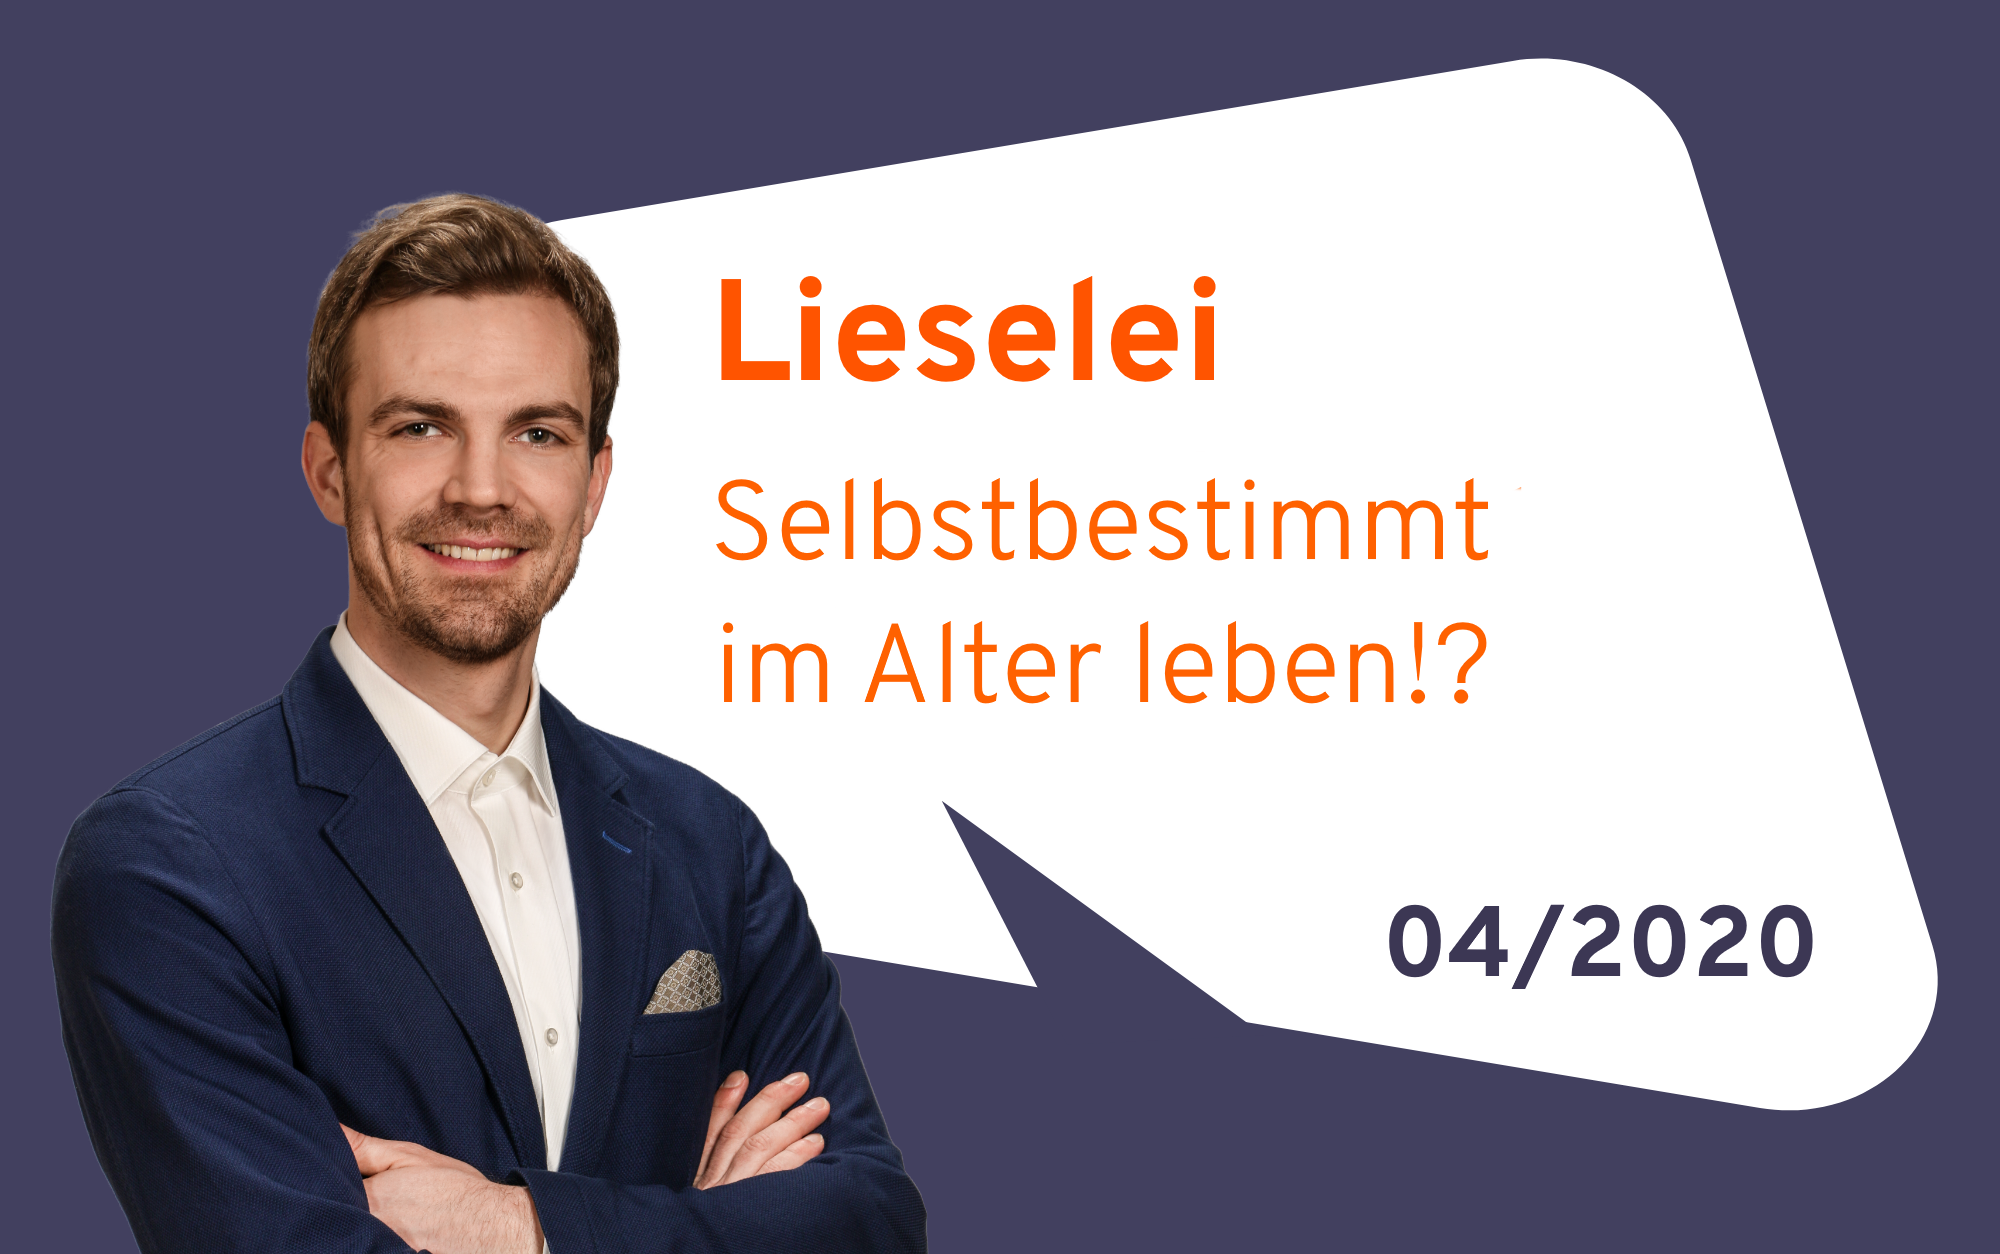 Lieselei – Selbstbestimmt Im Alter Leben!?